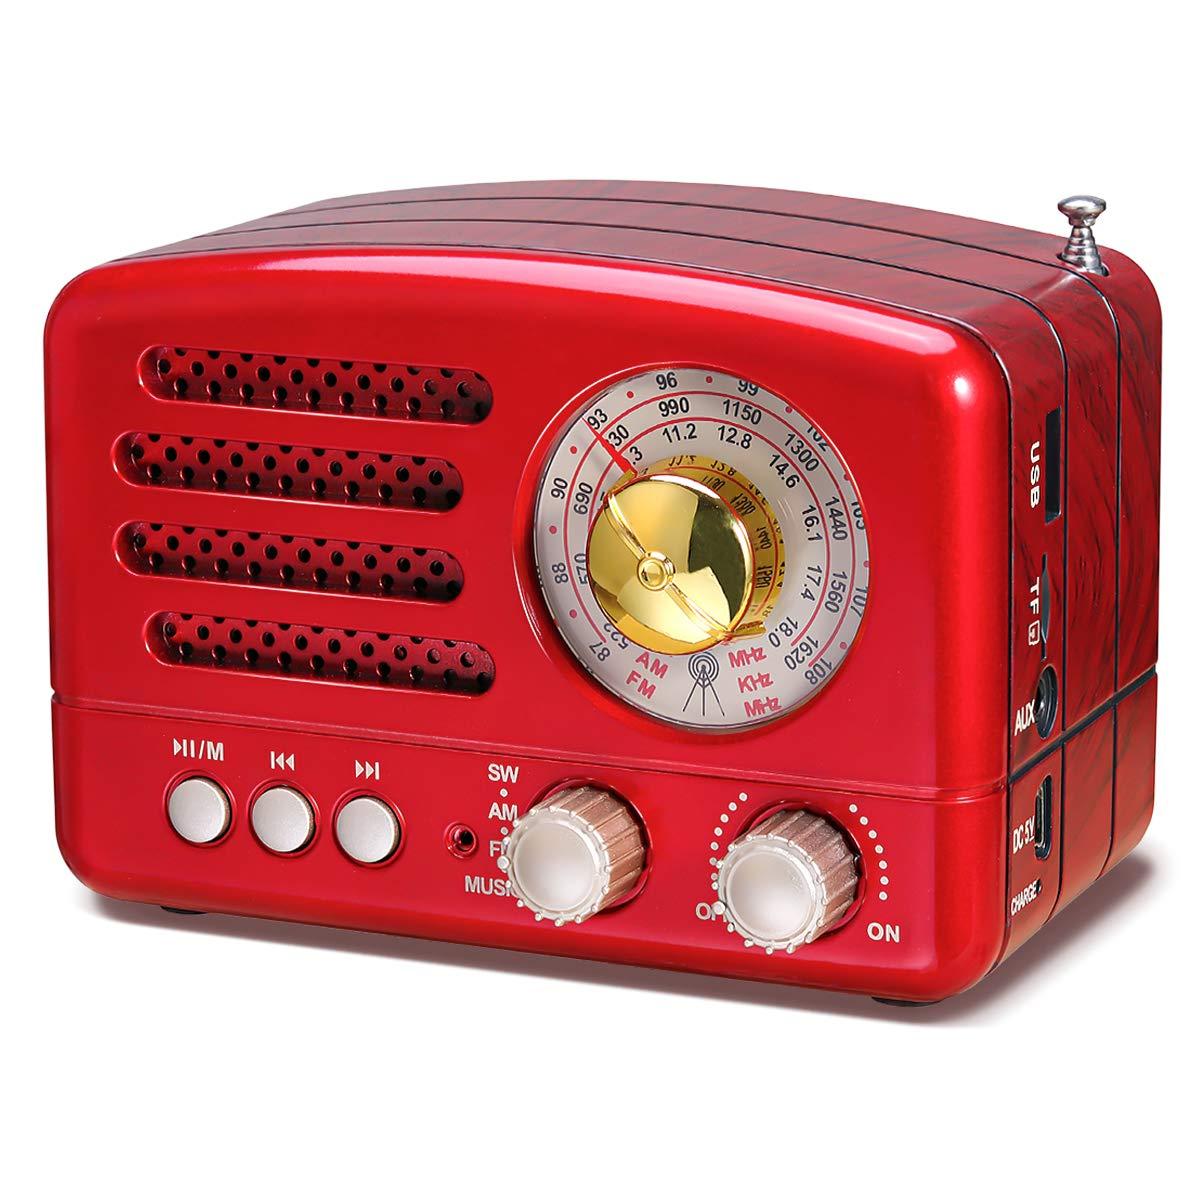 Rojo USB Incorporado Micro-SD Altavoz Bluetooth portatil Radio Retro con bater/ía Recargable de 1800mAh Actualizado J-160 Radio de Transistor port/átil peque/ña Entrada AUX